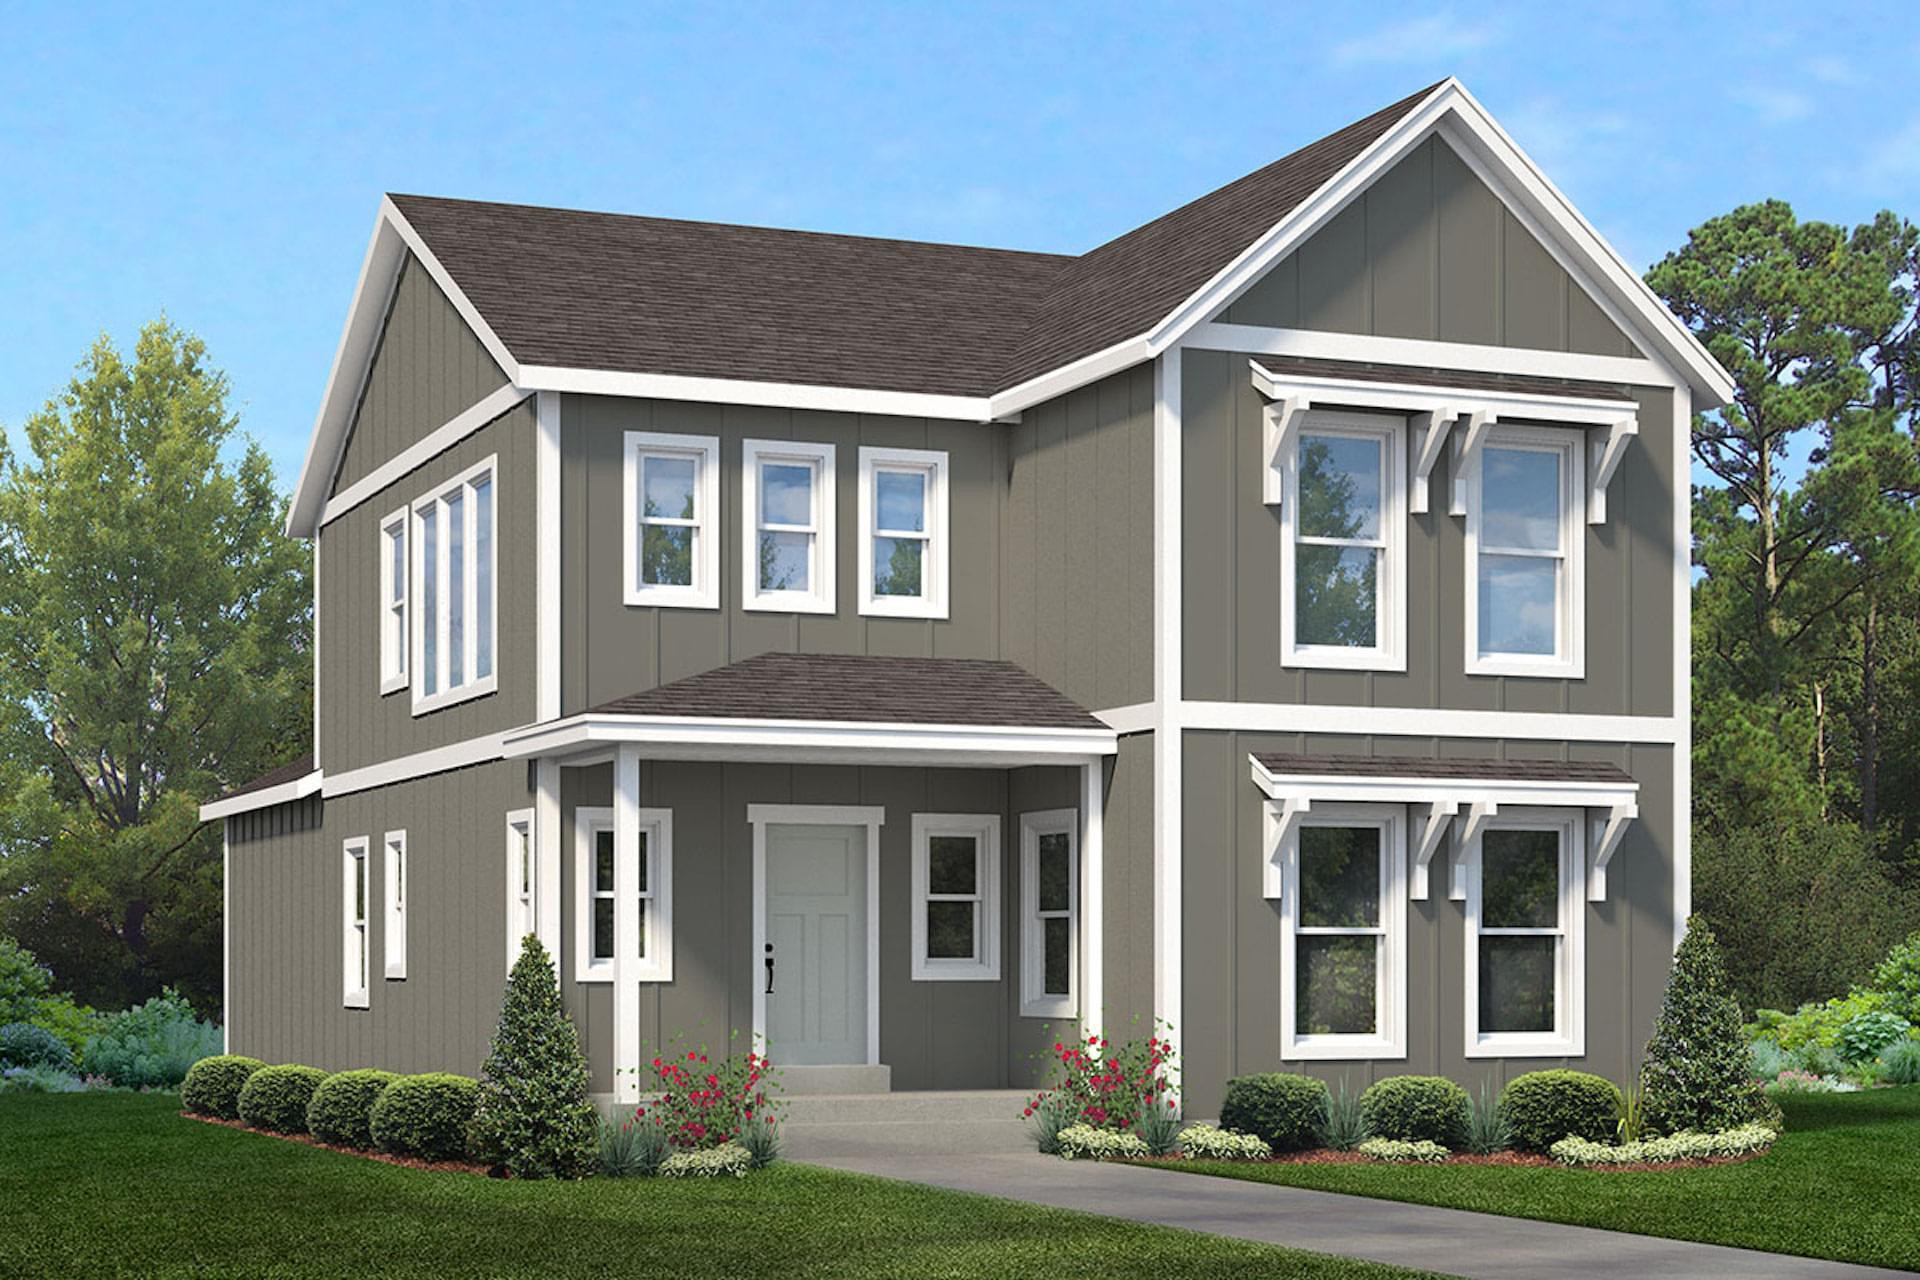 Greenside new home in Layton, UT